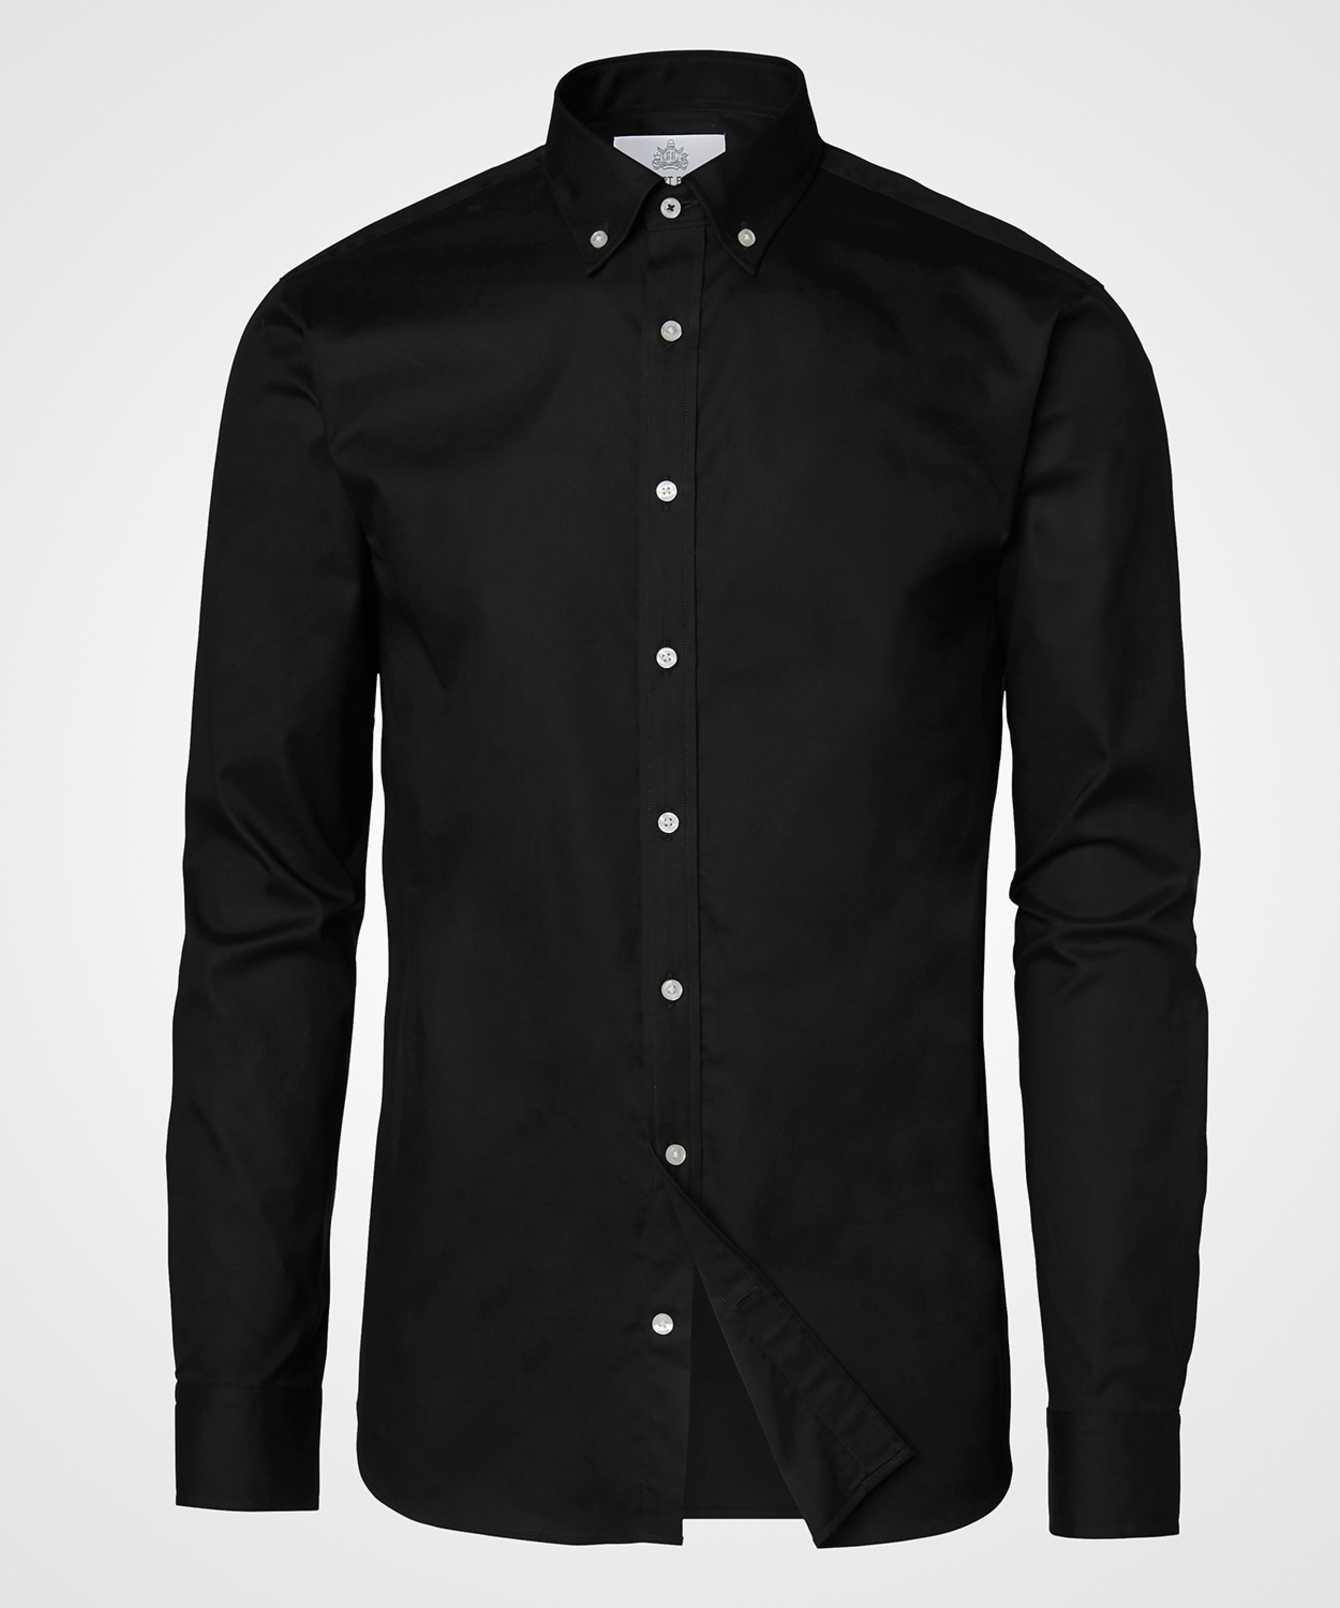 Skjorta Fine Oxford The Shirt Factory